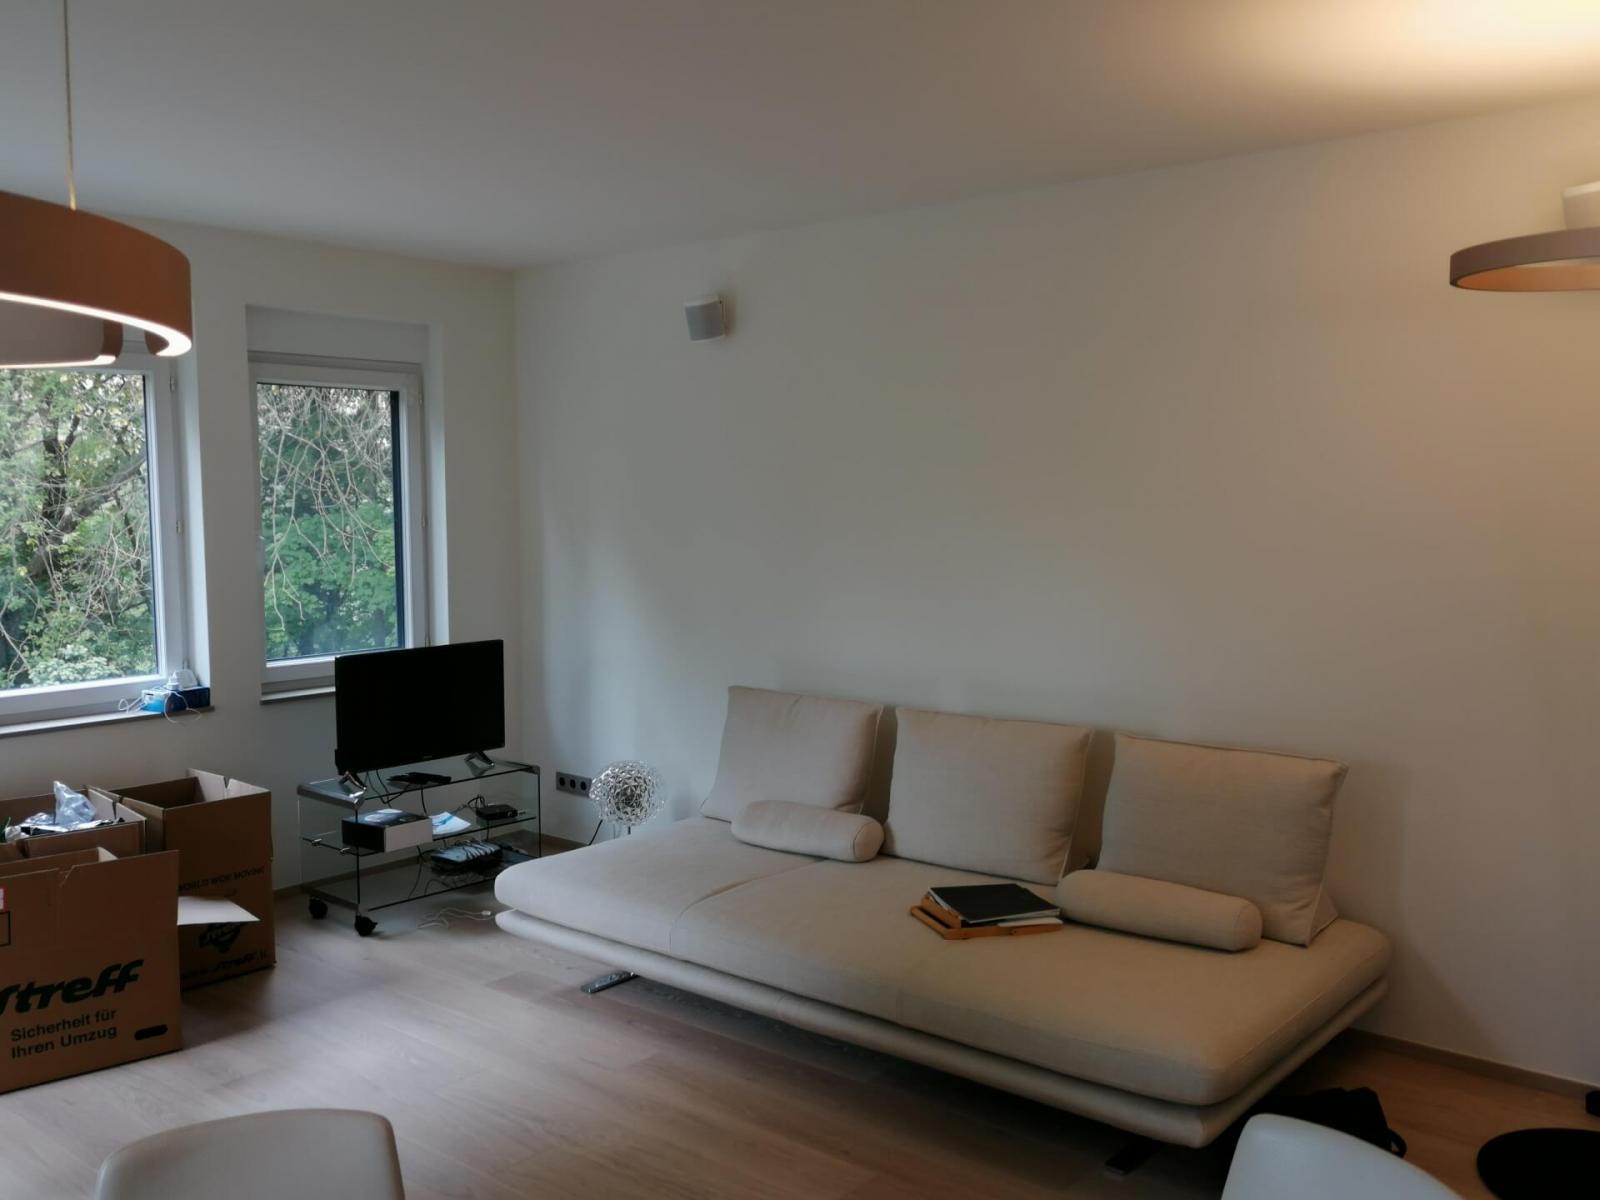 Appartement-Duplex-haute-gamme-Luxembourg-10